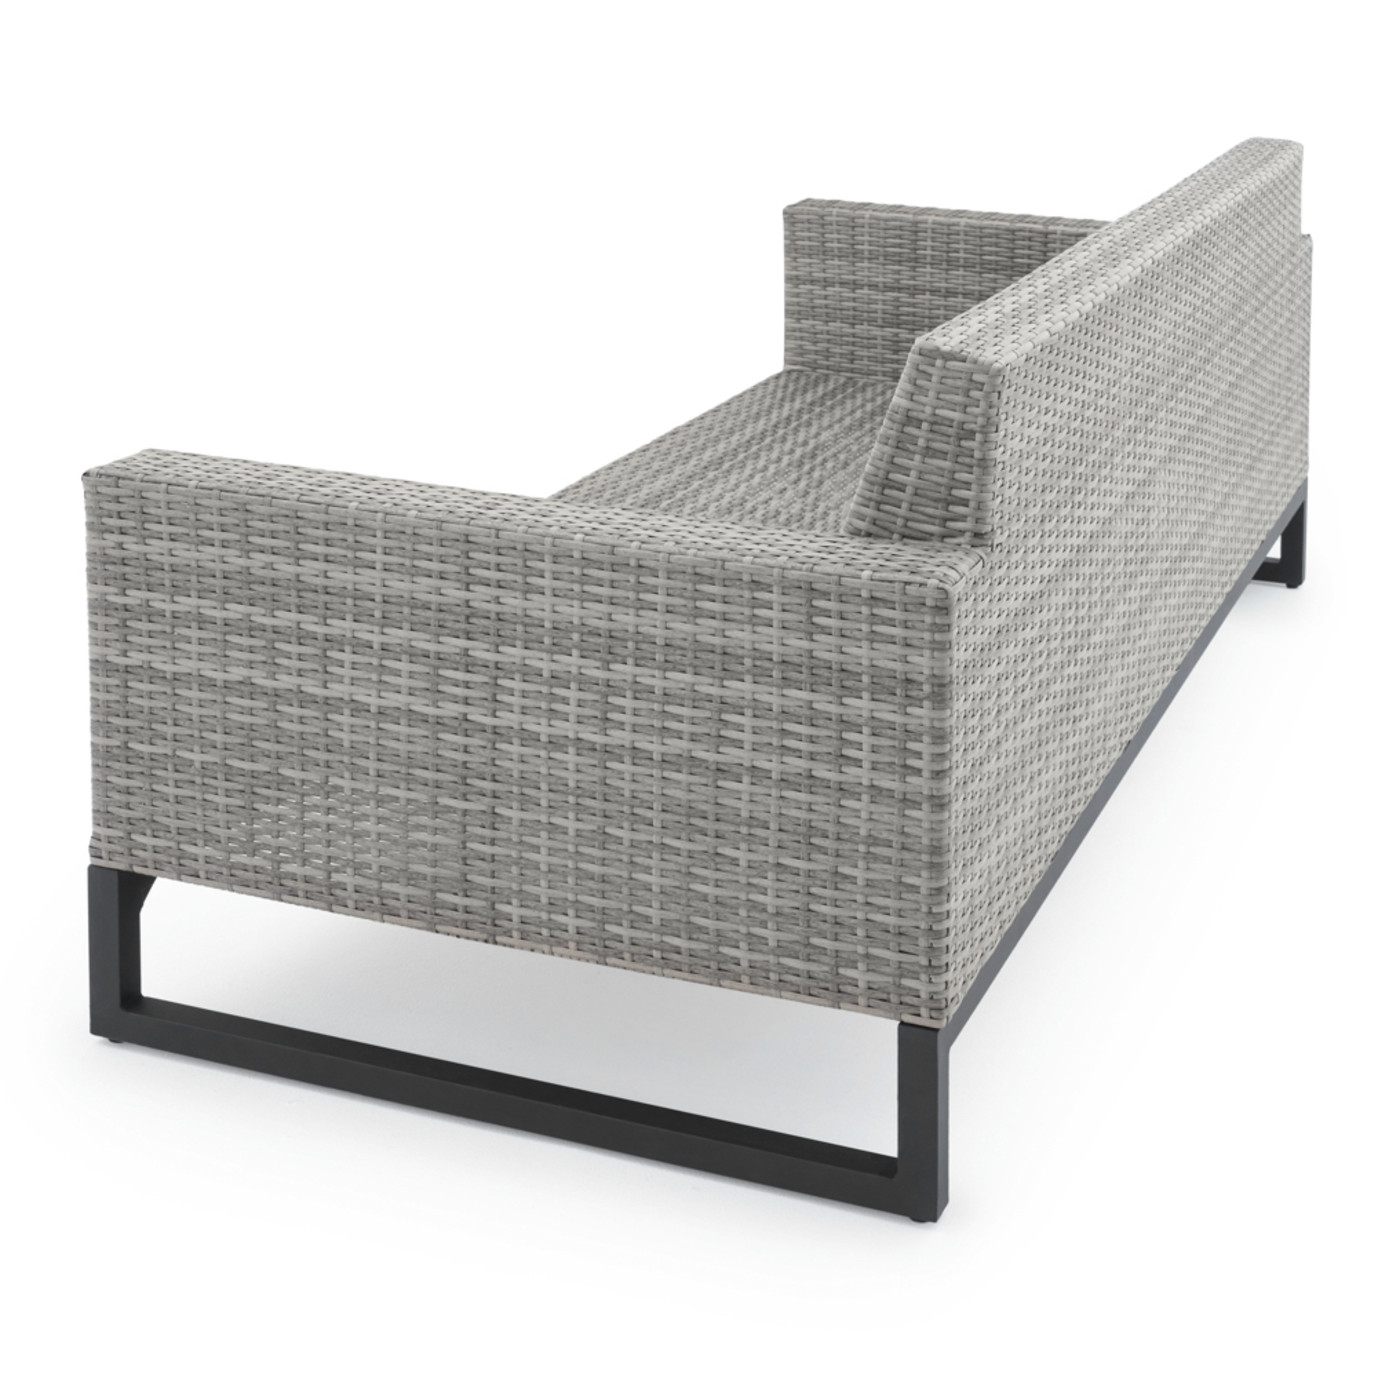 Milo™ Grey 7pc Deep Seating Set - Charcoal Grey